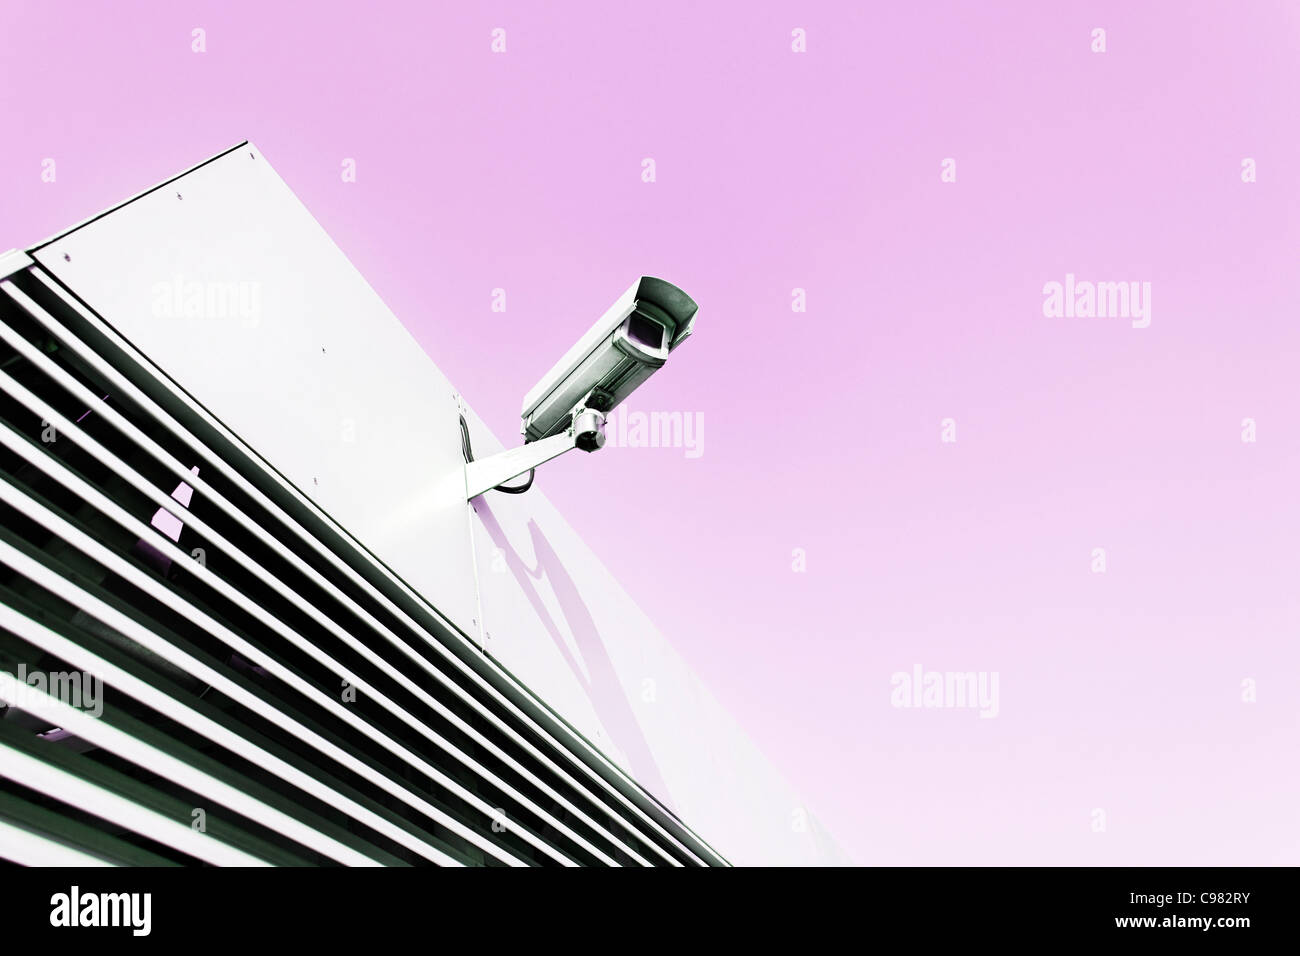 Surveillance camera on a building, cctv, vanilla sky - Stock Image